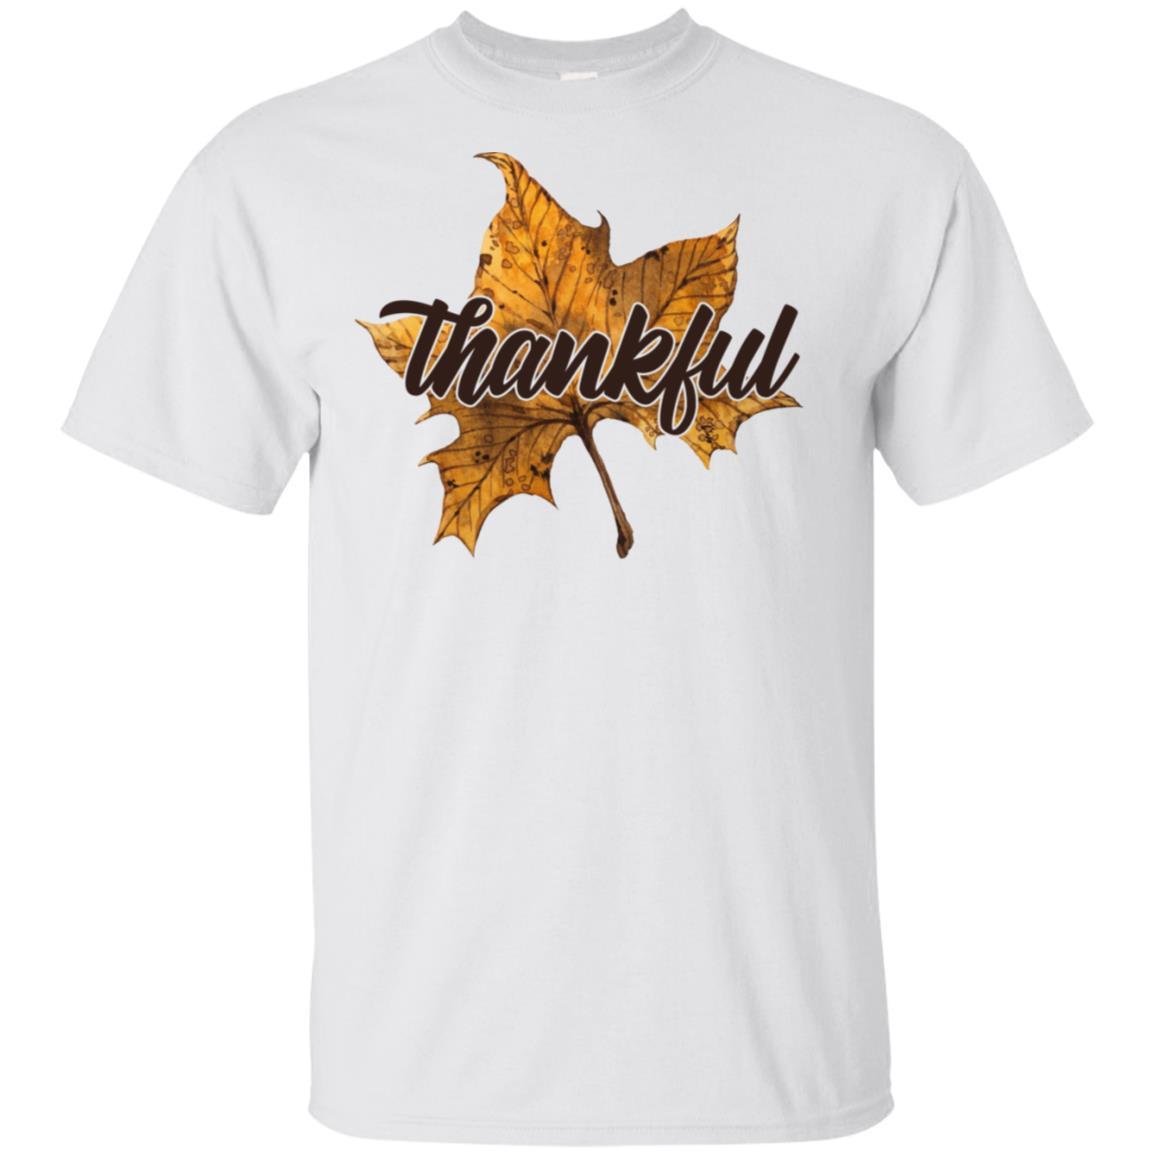 Autumn Leaves Festival Thanksgiving Holiday Gift Unisex Short Sleeve